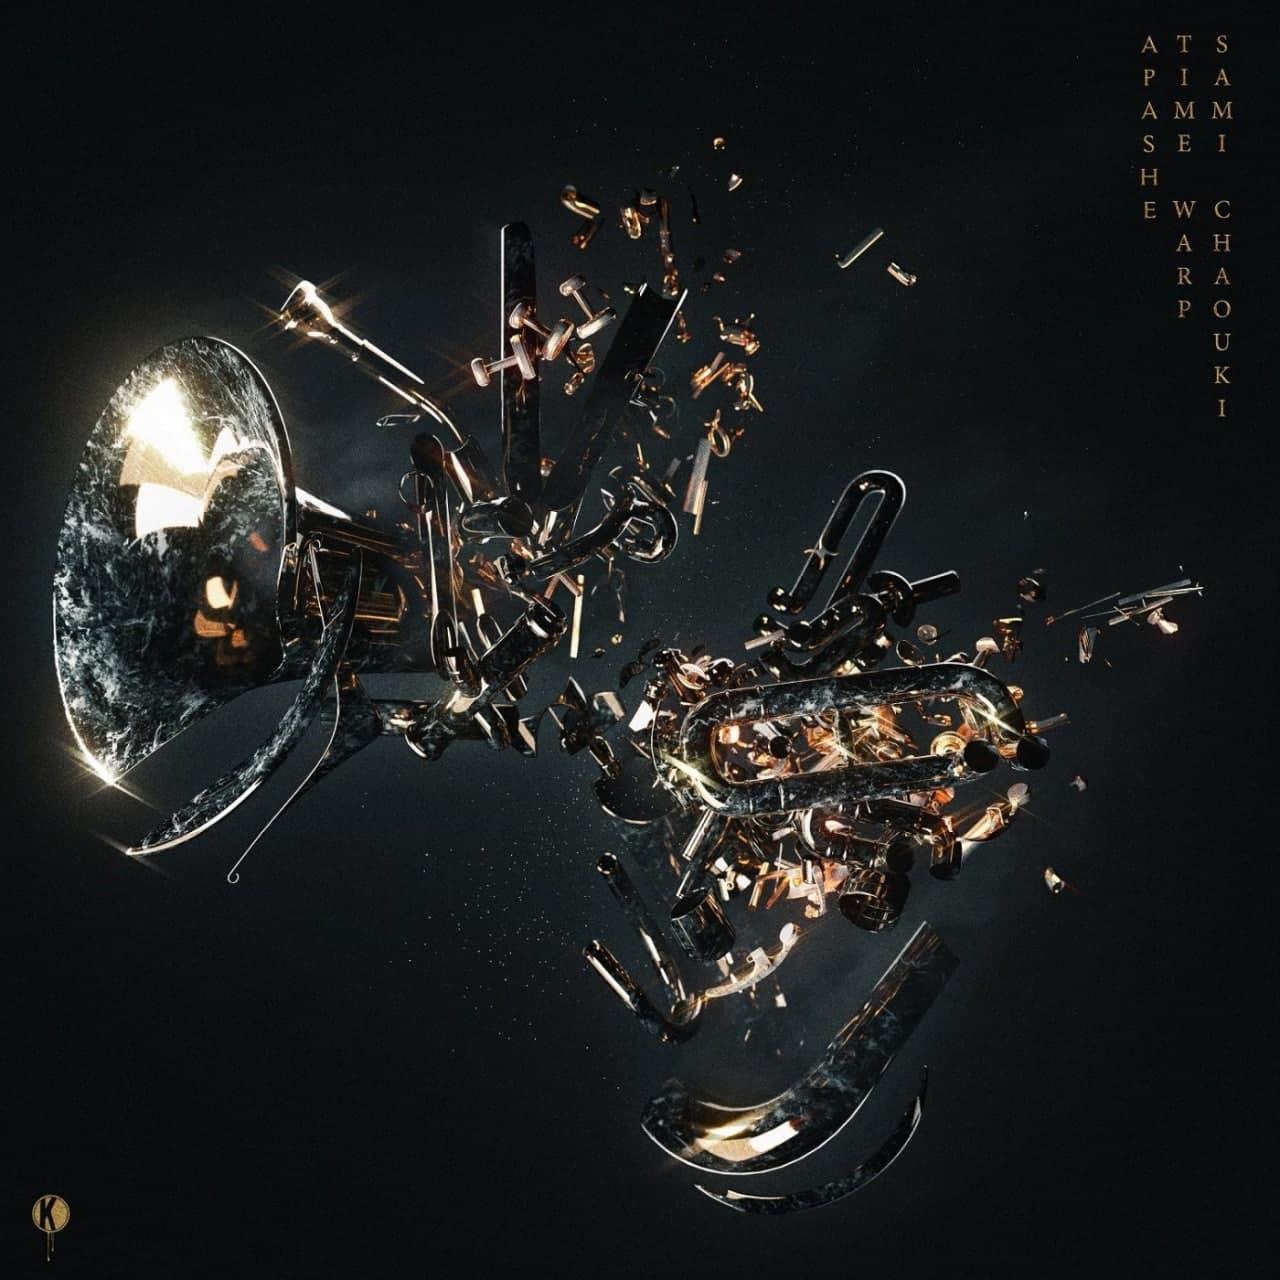 Cover du son d'Apashe en feat avec Sami Chaouki : Time Wrap